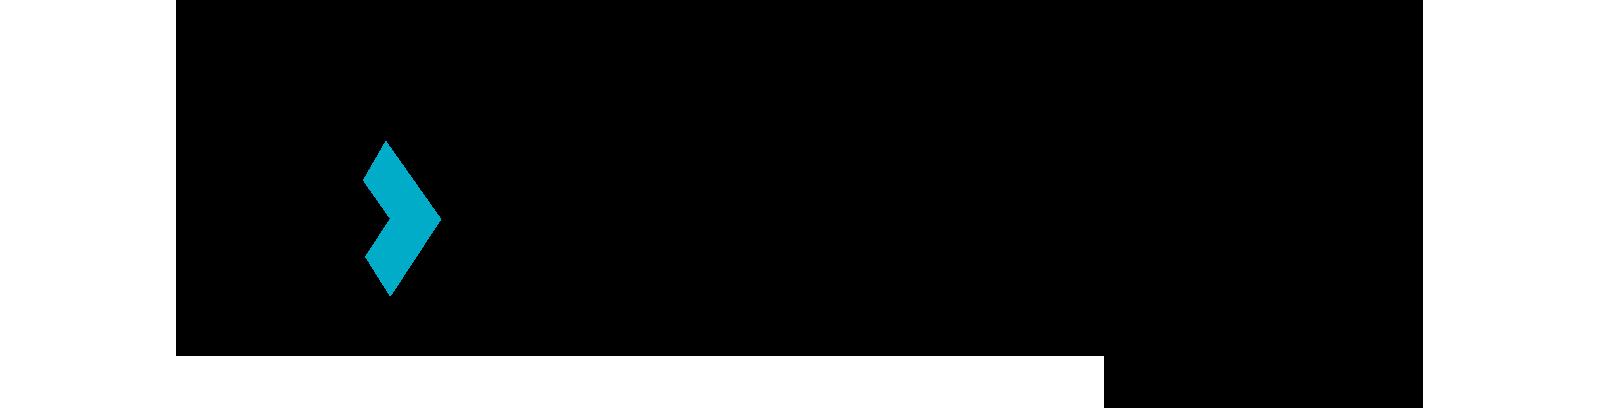 Kubity logo